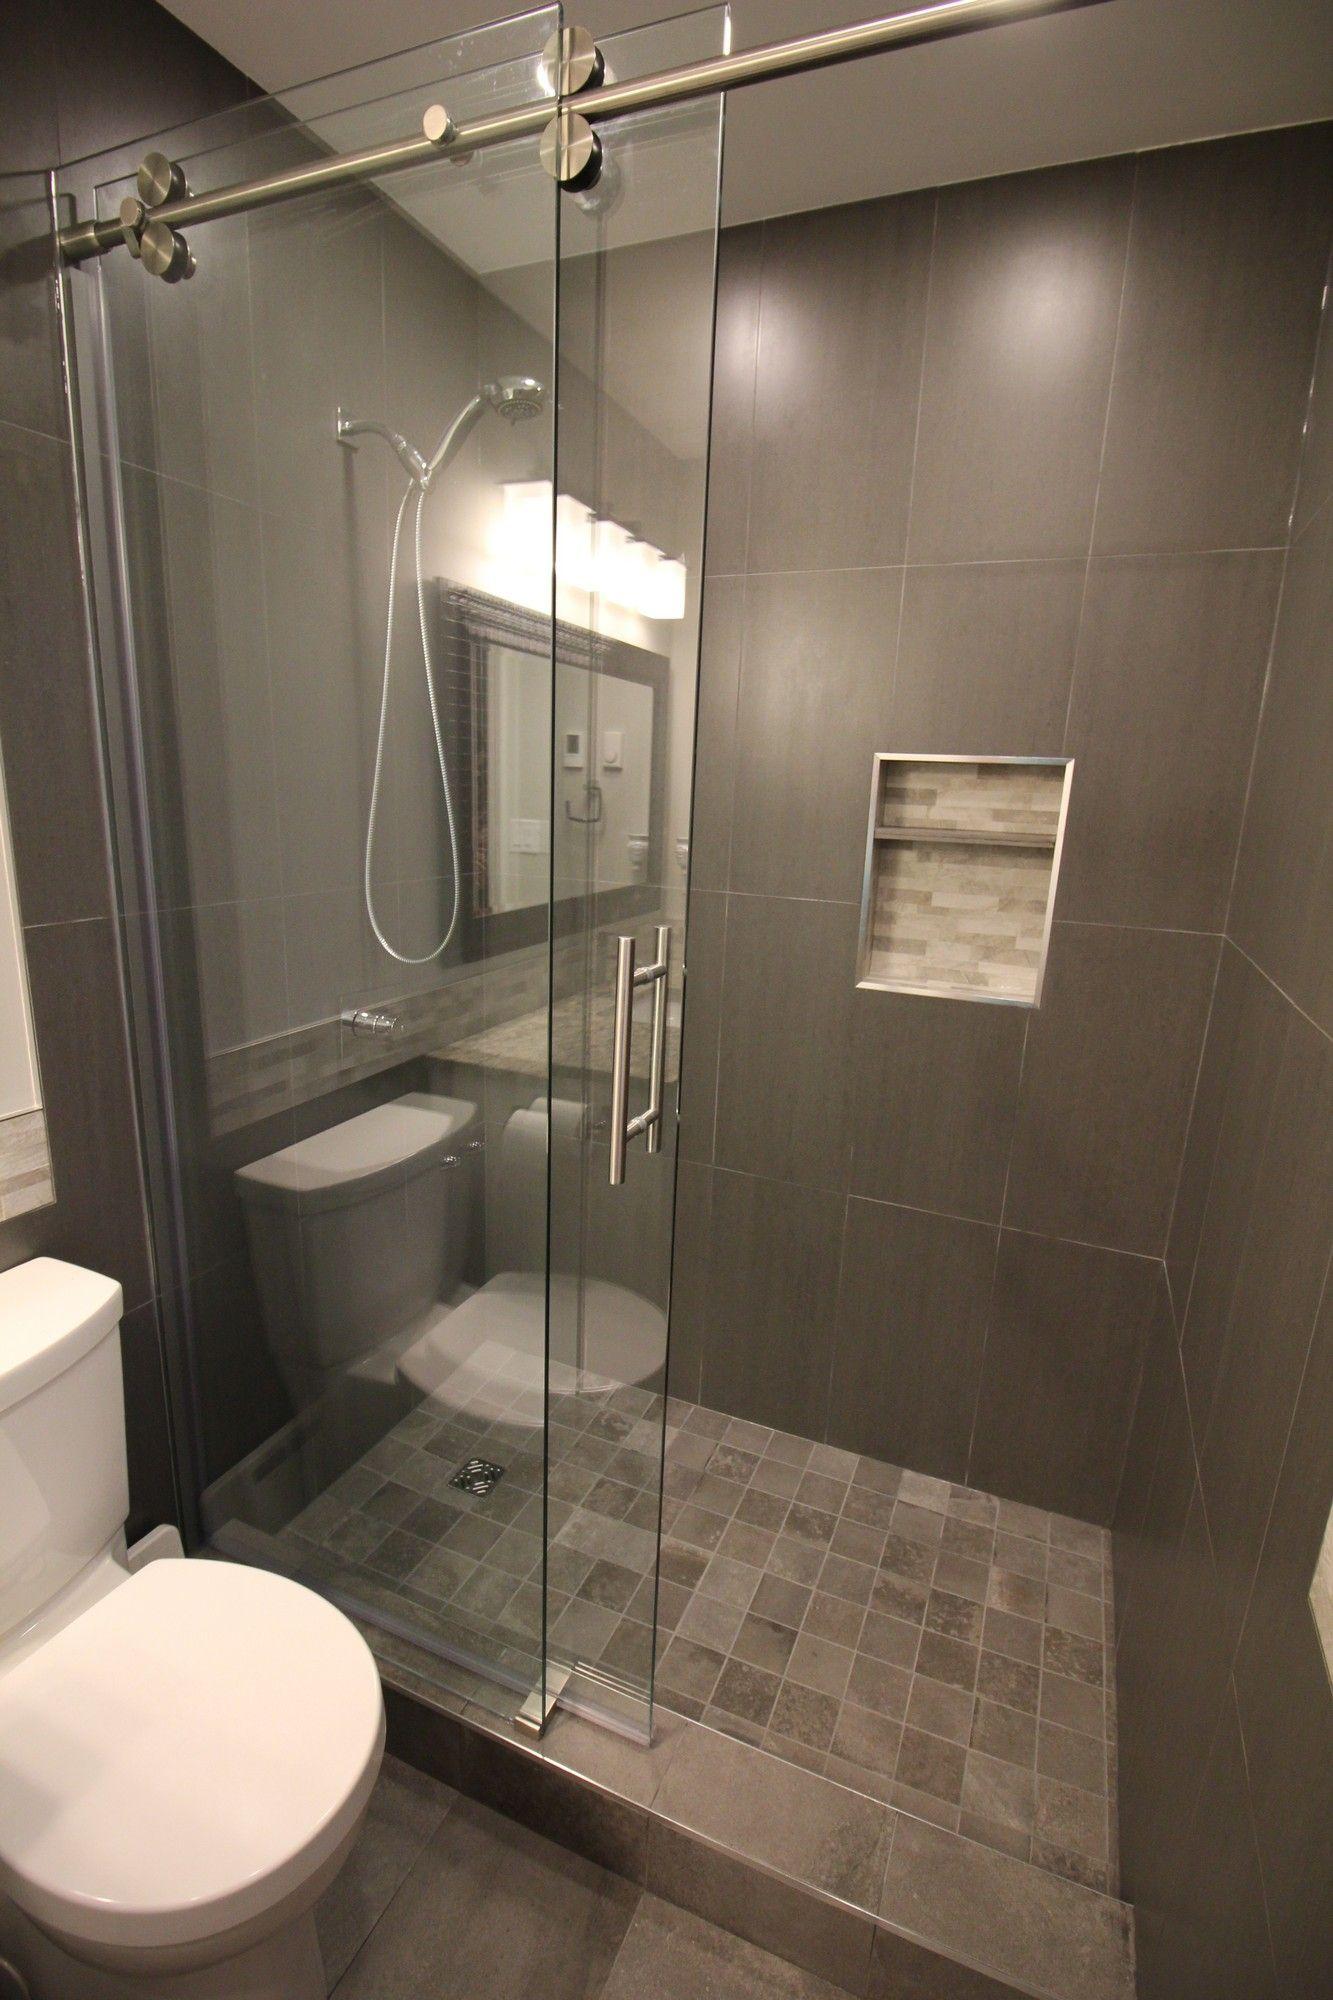 Master bedroom ensuite ideas   Modern Ensuite Bathroom Ideas TIPS FOR PLANNING IT  Ensuite